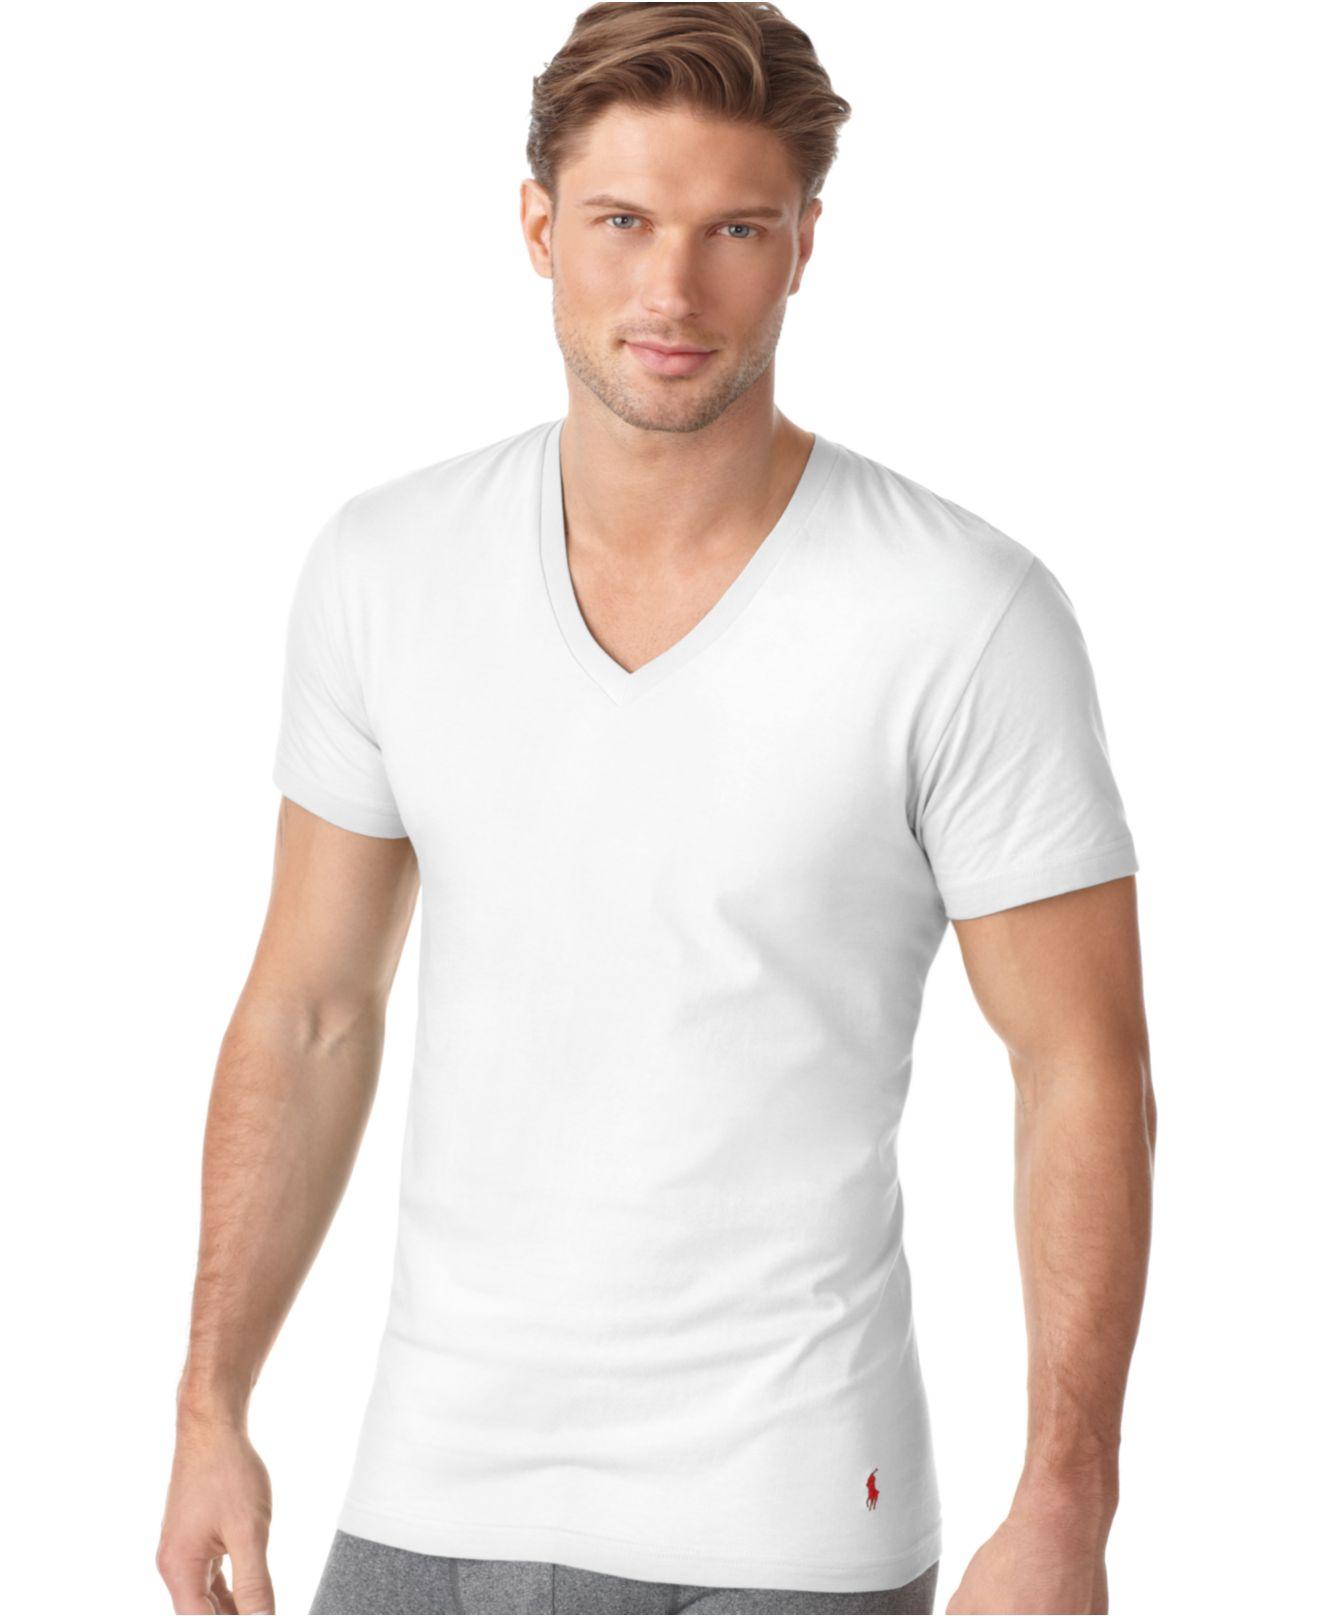 4fcc0f628c6 Polo Ralph Lauren Ralph Lauren Men'S Underwear, Classic Cotton V ...